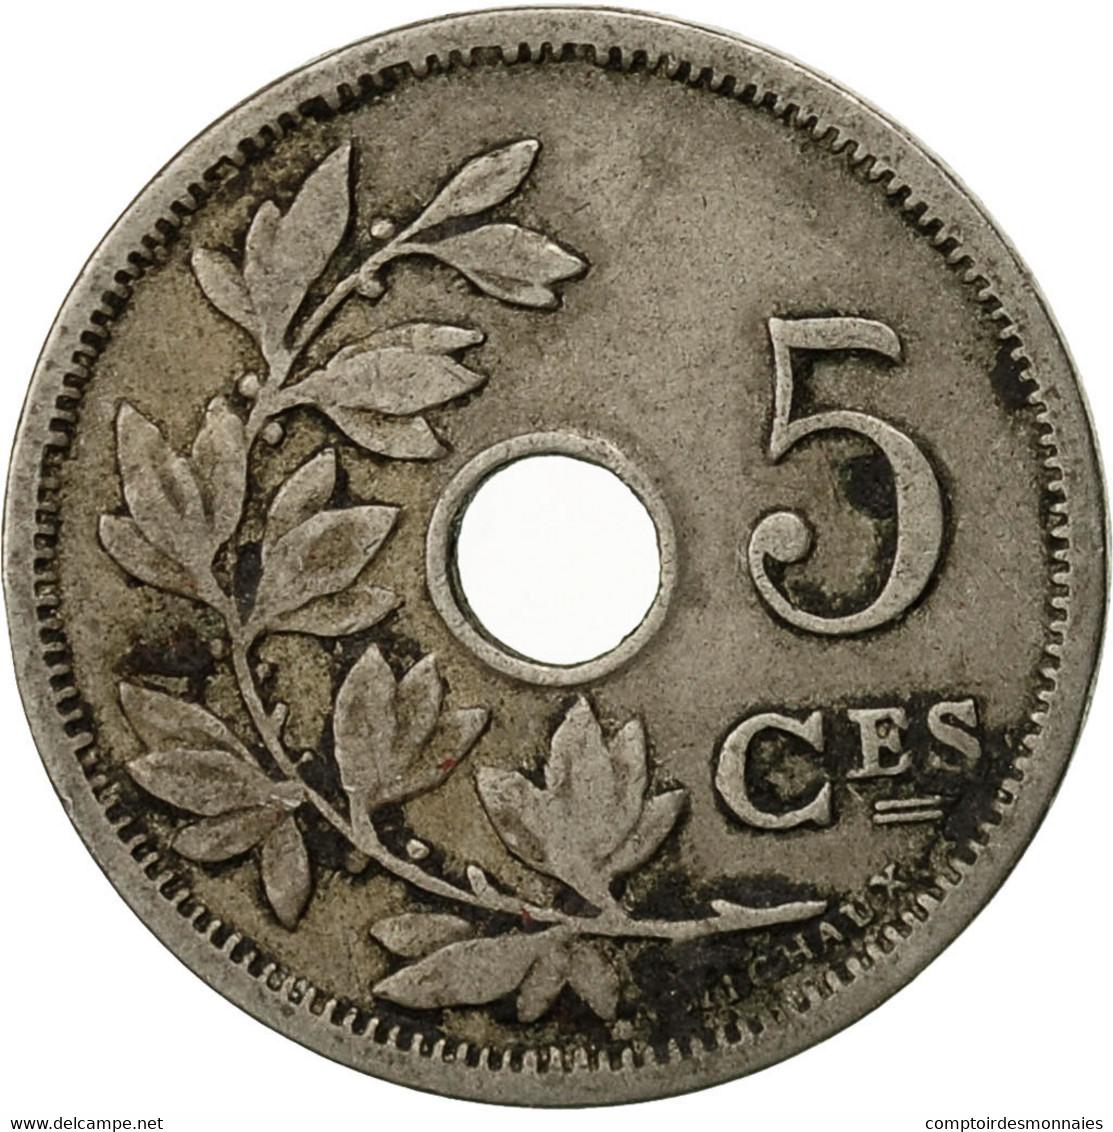 Belgique, 5 Centimes, 1905, TB+, Copper-nickel, KM:54 - 03. 5 Centimes